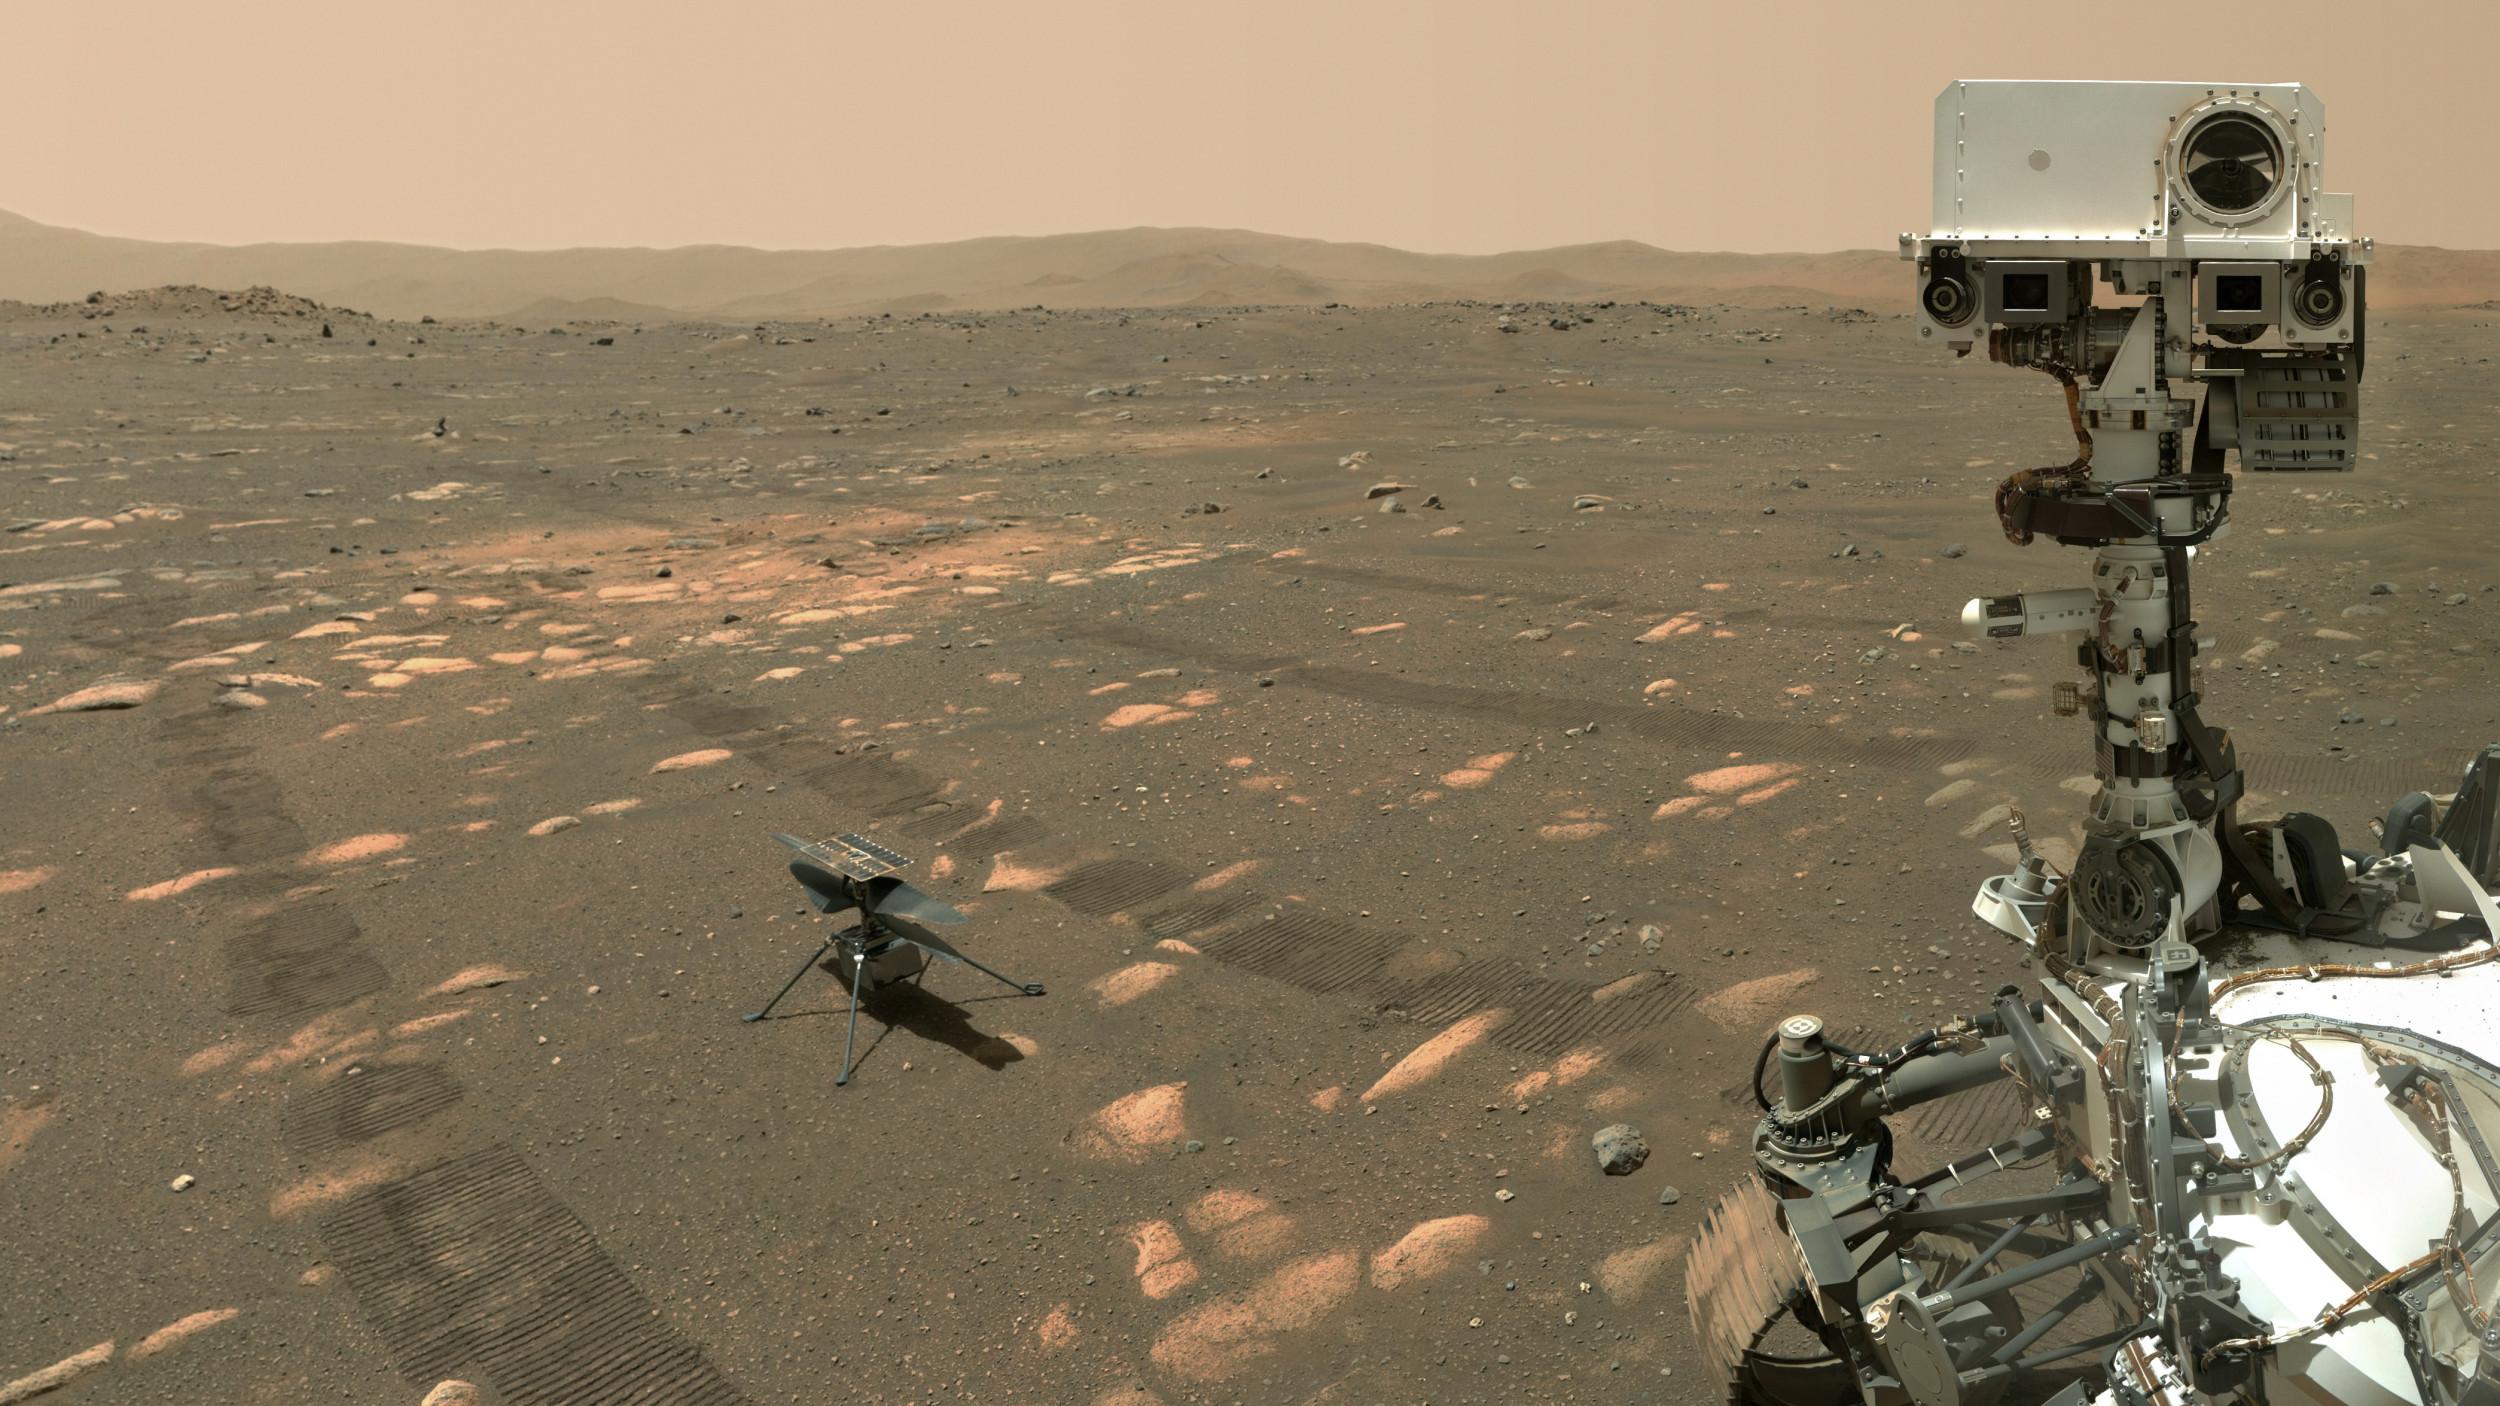 Every NASA Perseverance Milestone so Far As Rover Makes Oxygen on Mars